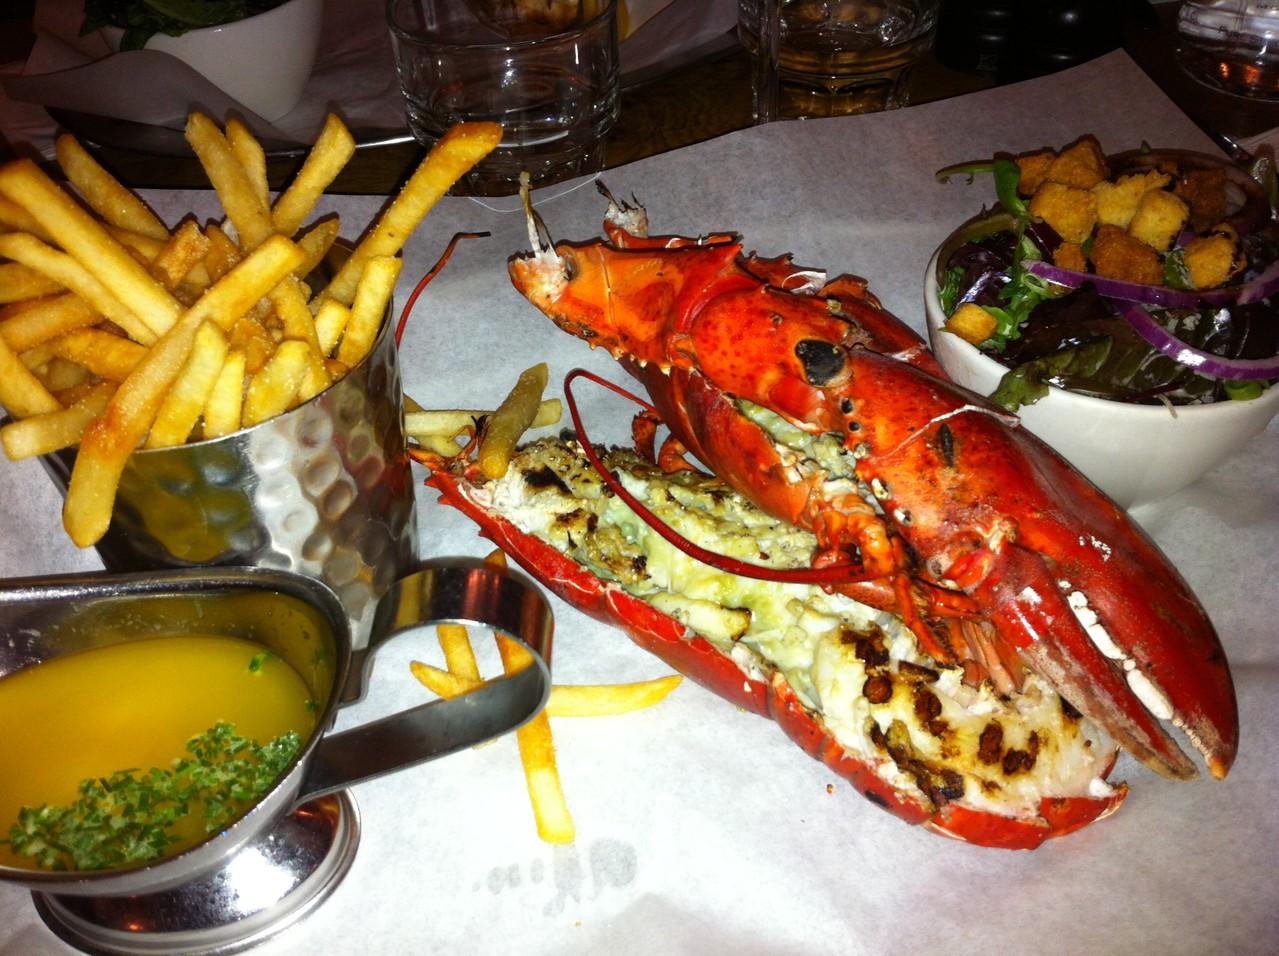 Lobster@Burger&Lobster - London, United Kingdom